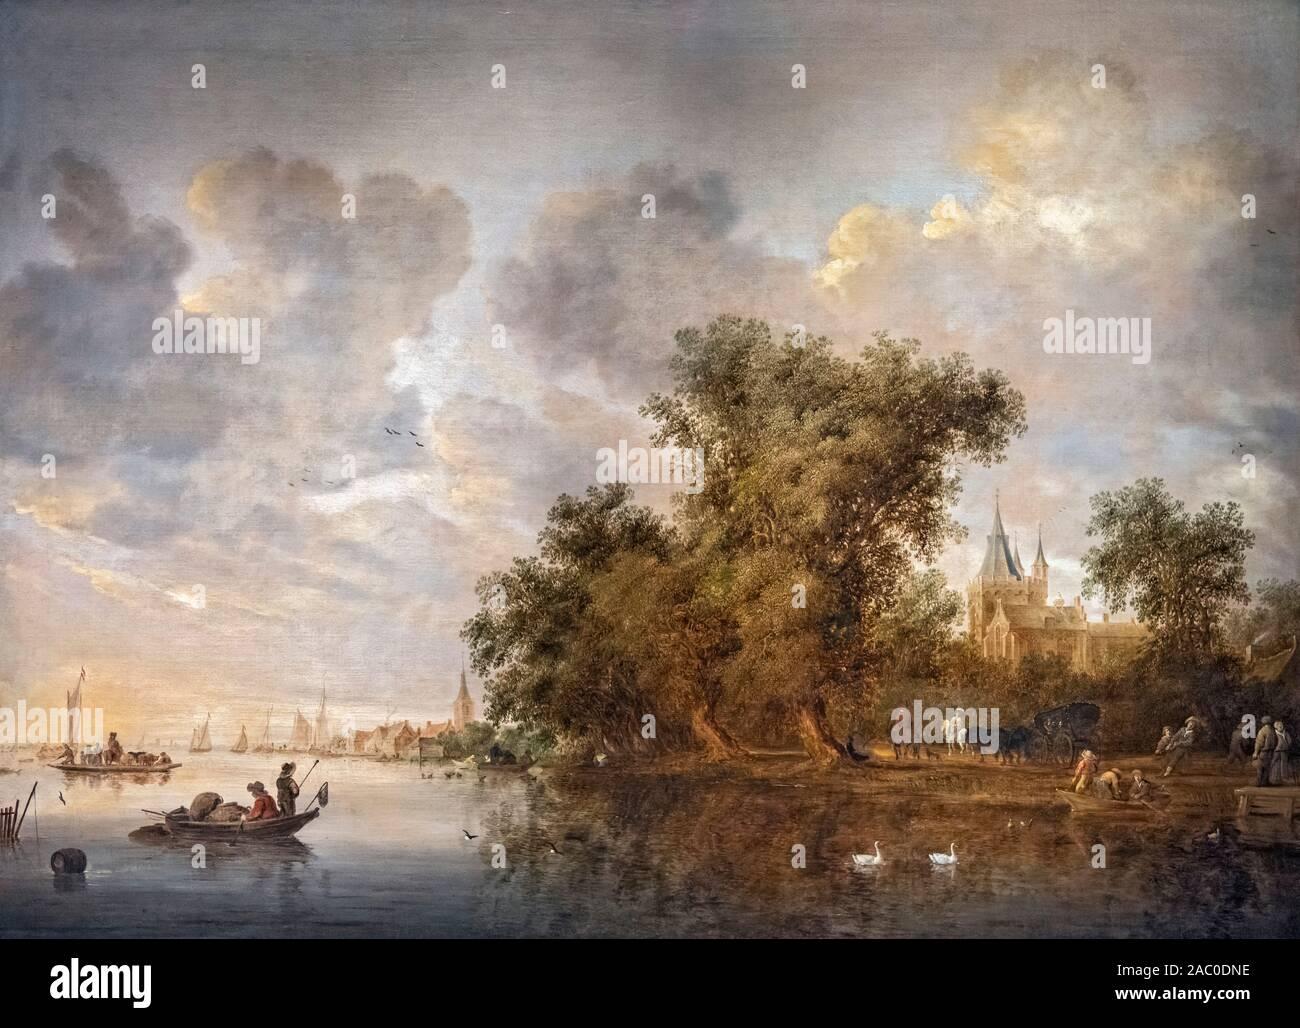 River Landscape by Salomon Jacobsz van Ruysdael (c.1602-1670), oil on canvas, 1643 Stock Photo